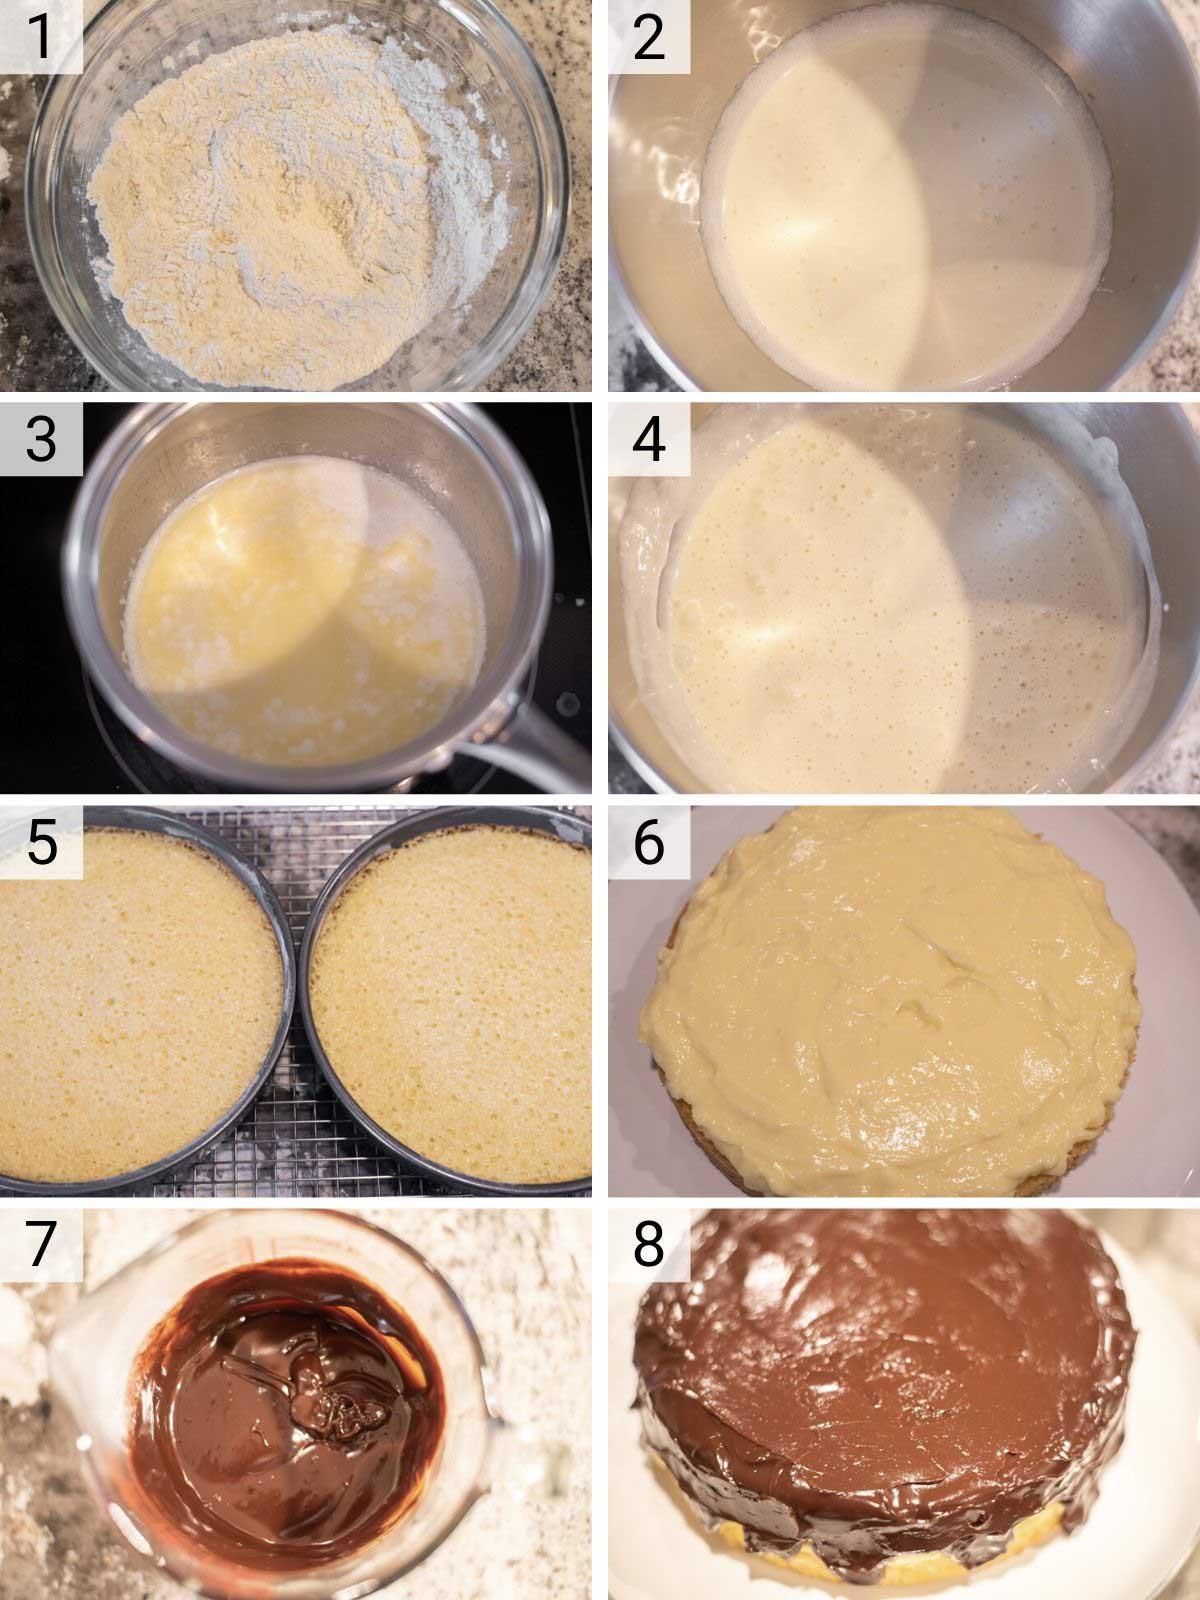 process shots of how to make Boston cream pie